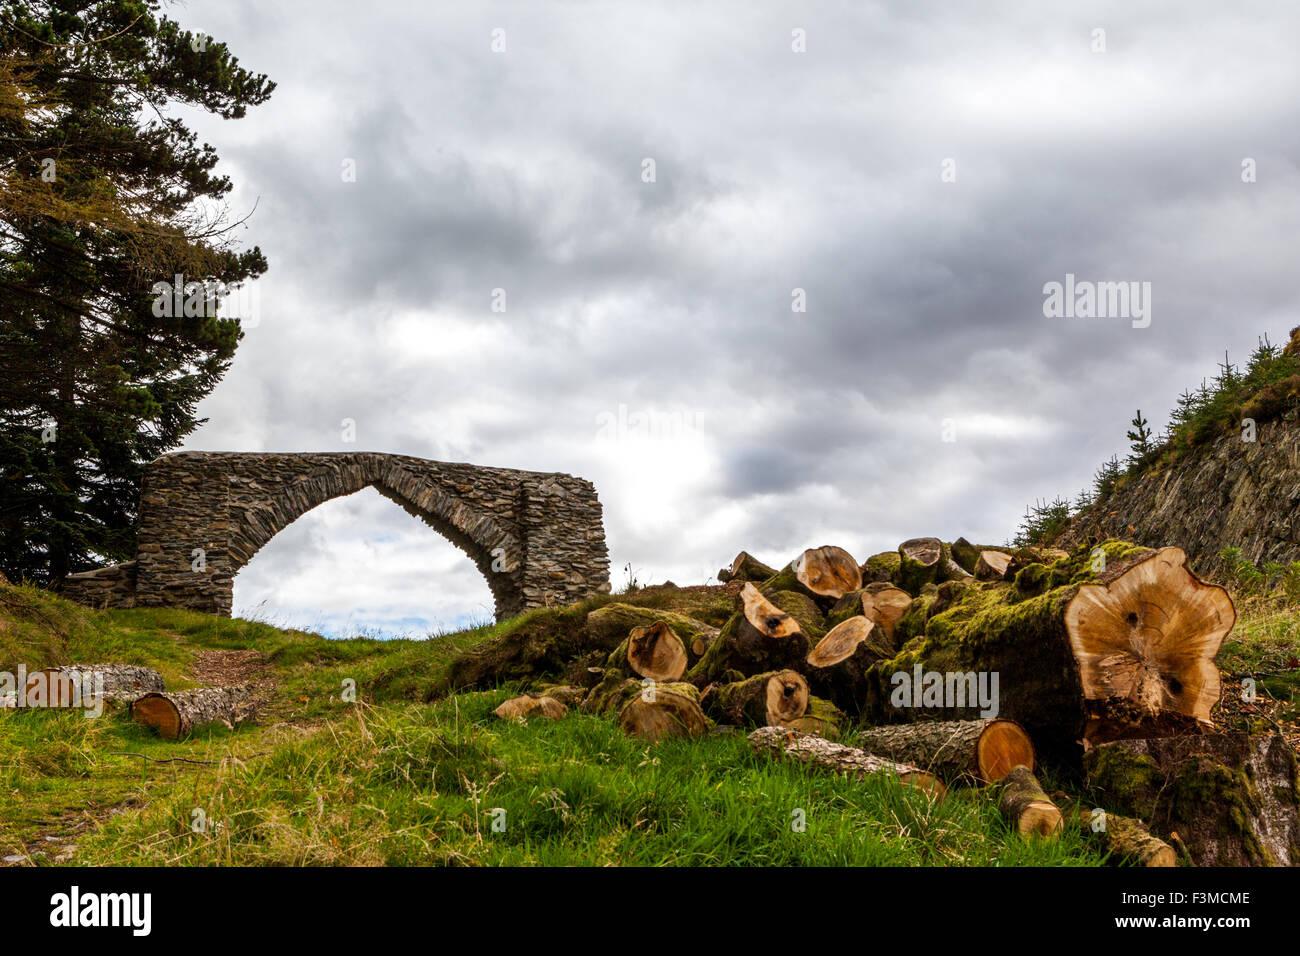 The Arch near Devils bridge mid Wales UK - Stock Image